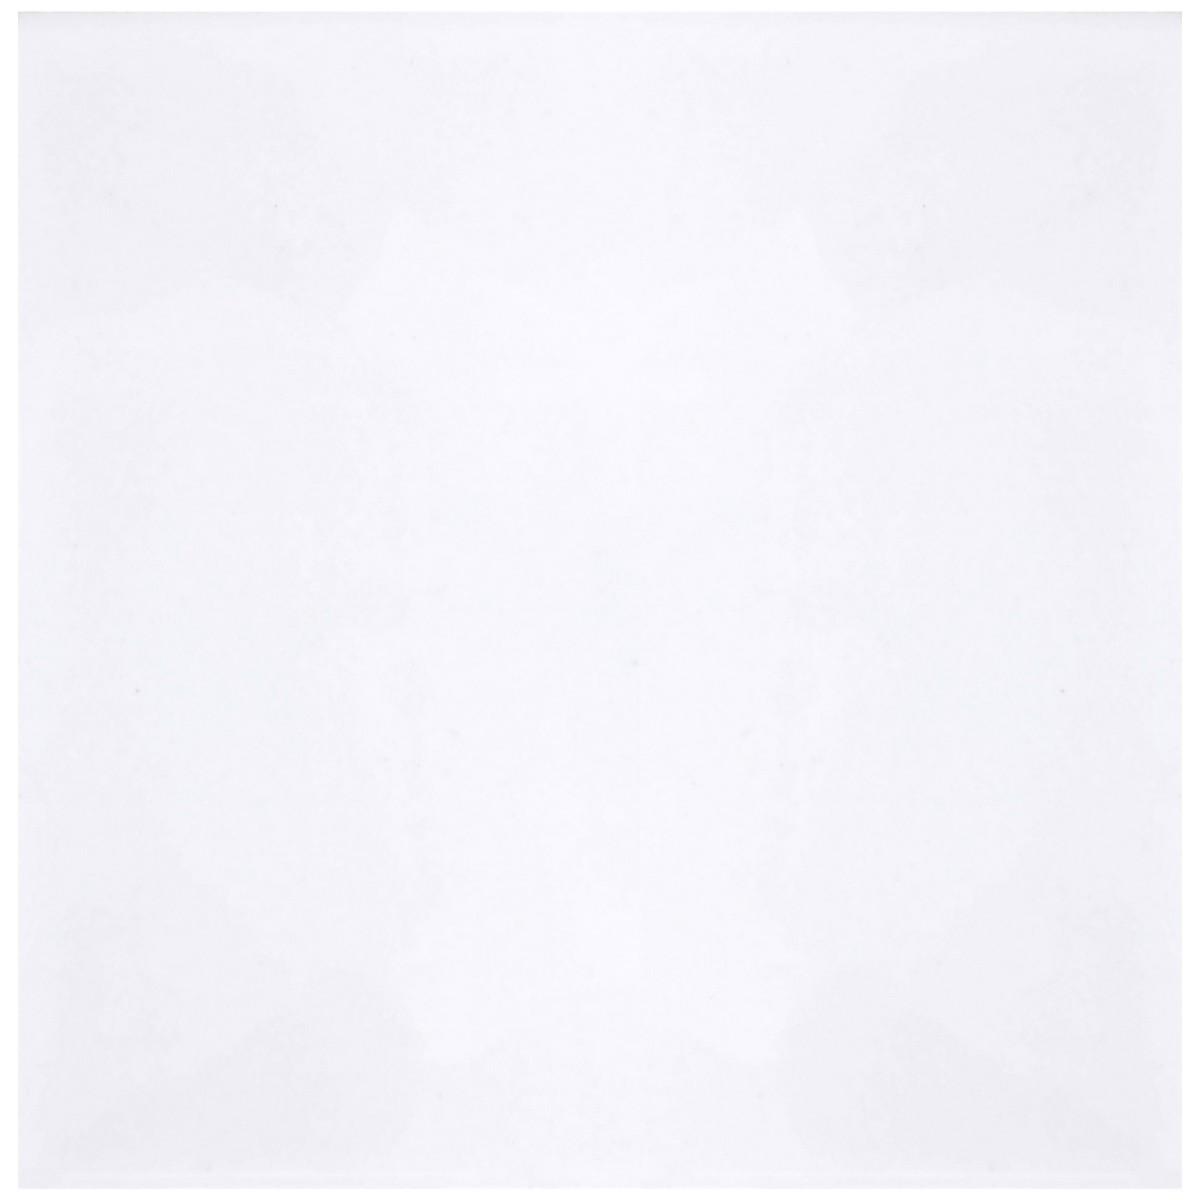 Плитка настенная GT 20х20 см 0.88 м2 цвет белый